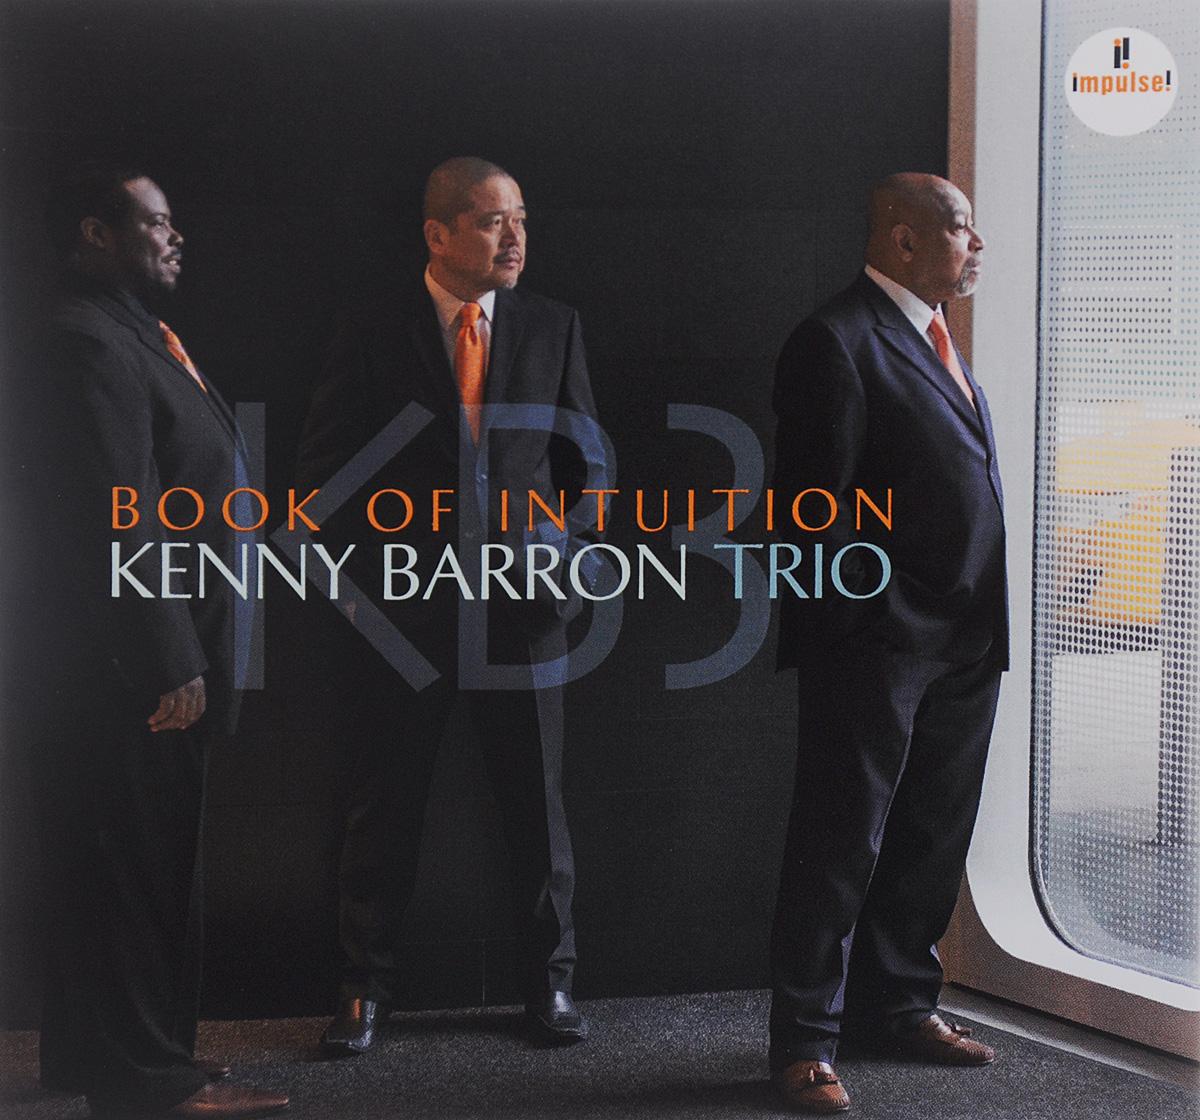 Кени Баррон,Телониус Монк,Чарли Хэйден Kenny Barron Trio - Book Of Intuition телониус монк эрролл гарнер jazz piano выпуск 4